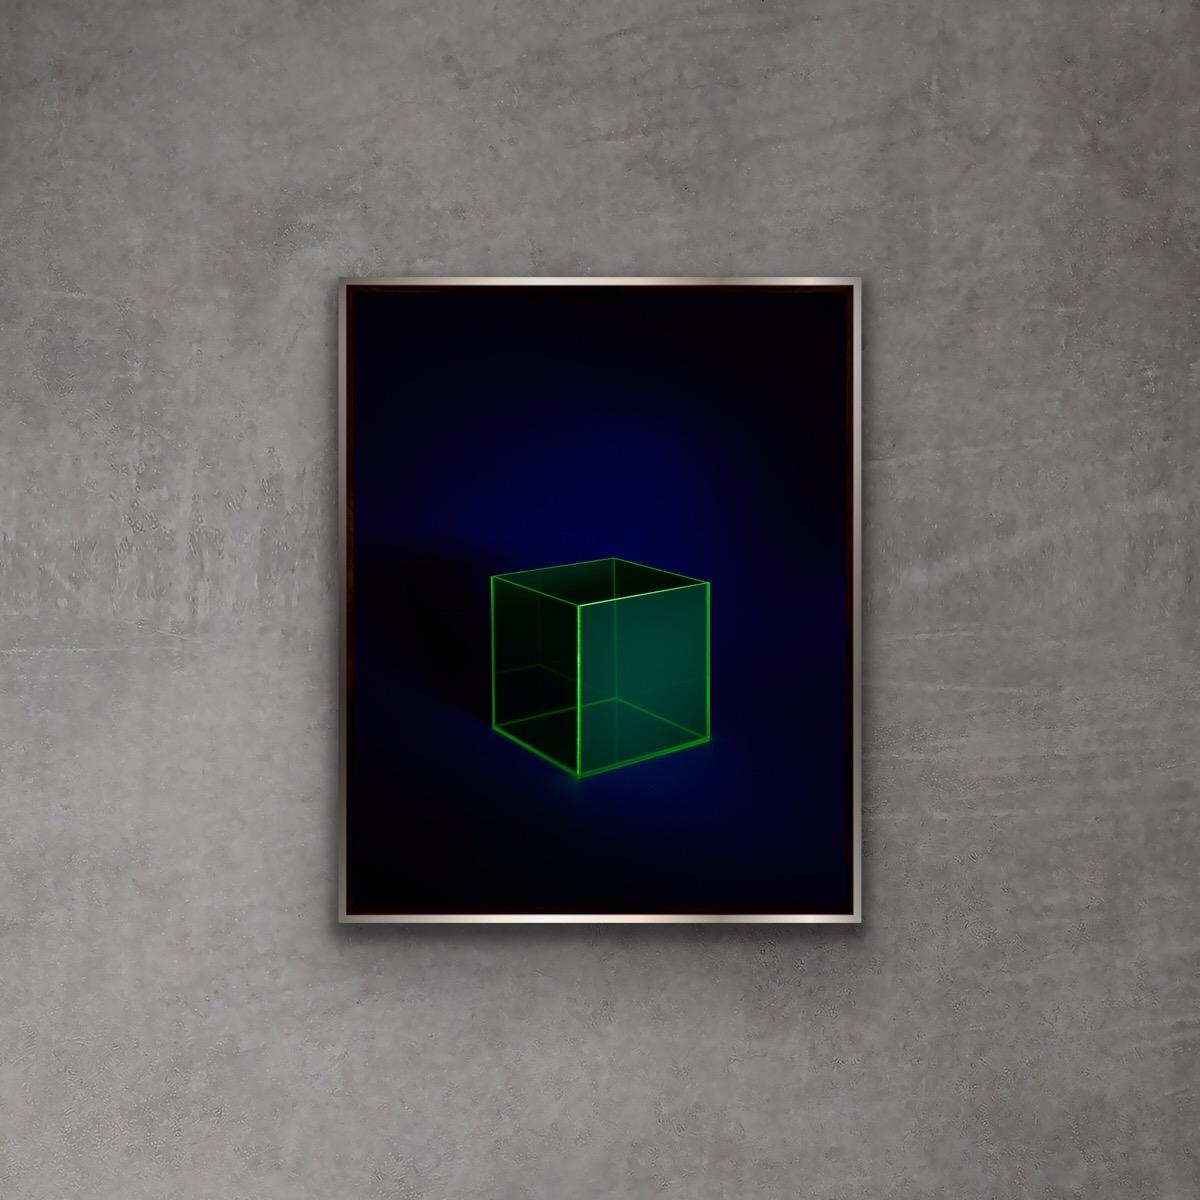 VOID by Grete Hjorth-Johansen, on a concrete wall